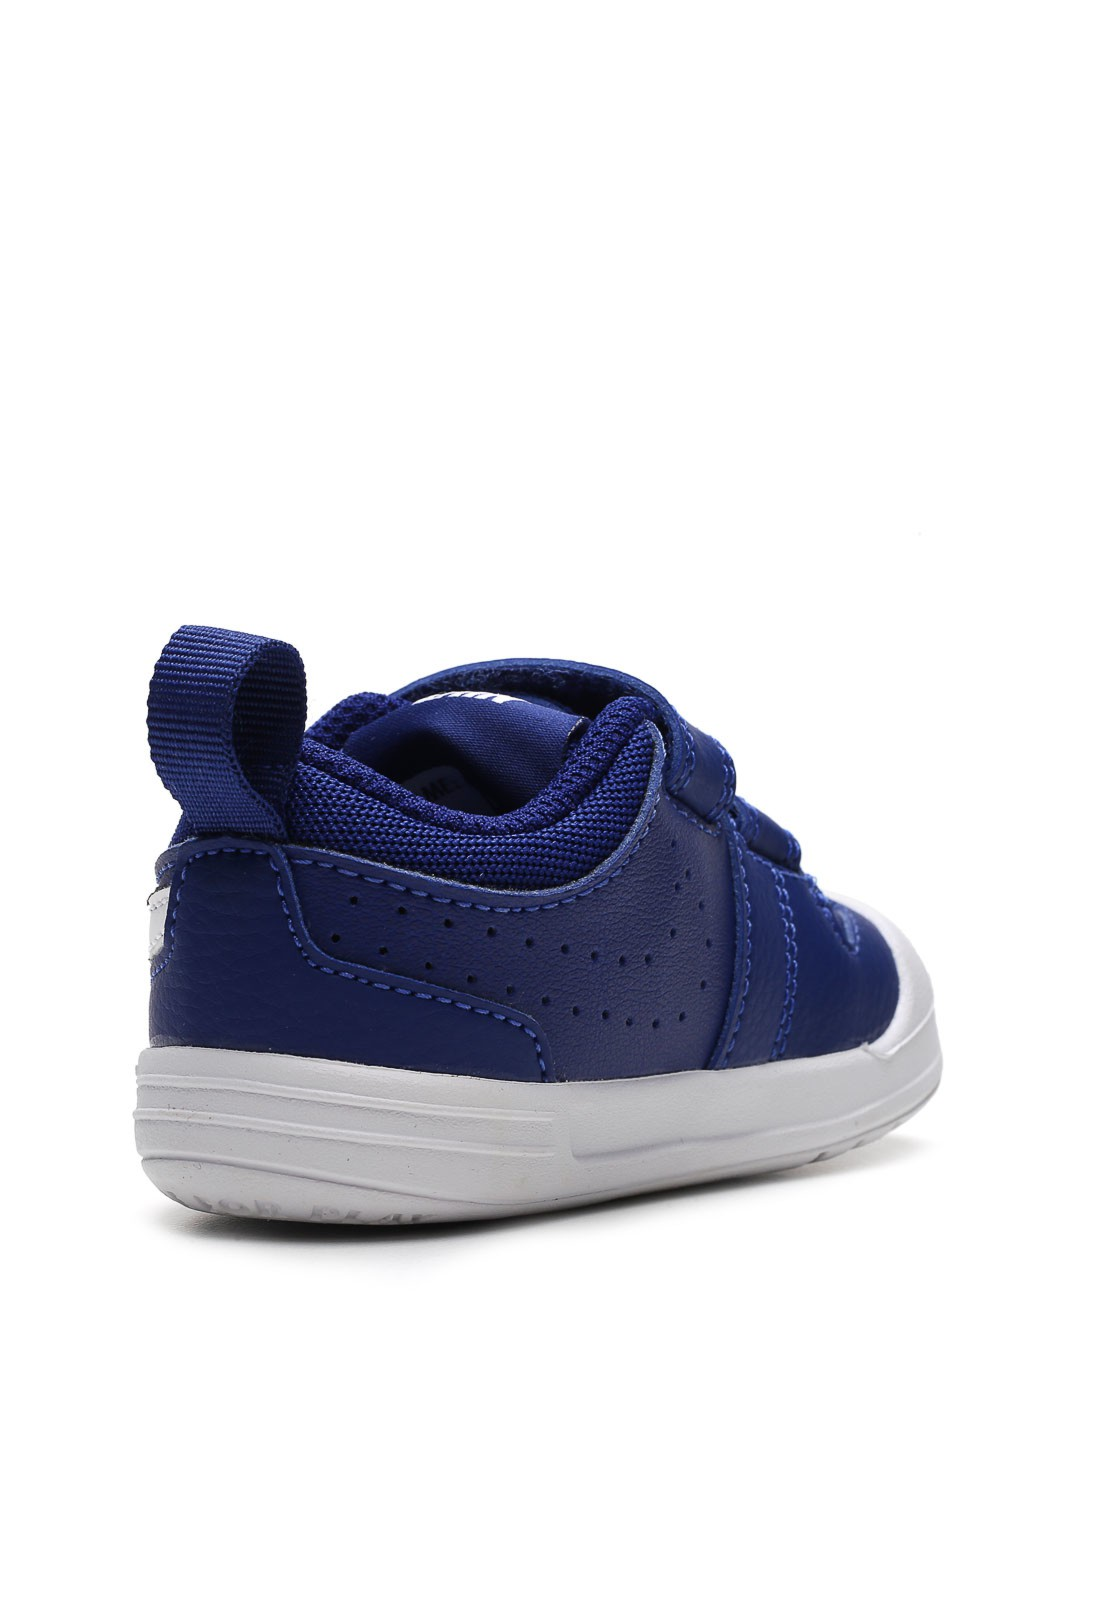 Tênis Nike Infantil Pico 5 Azul